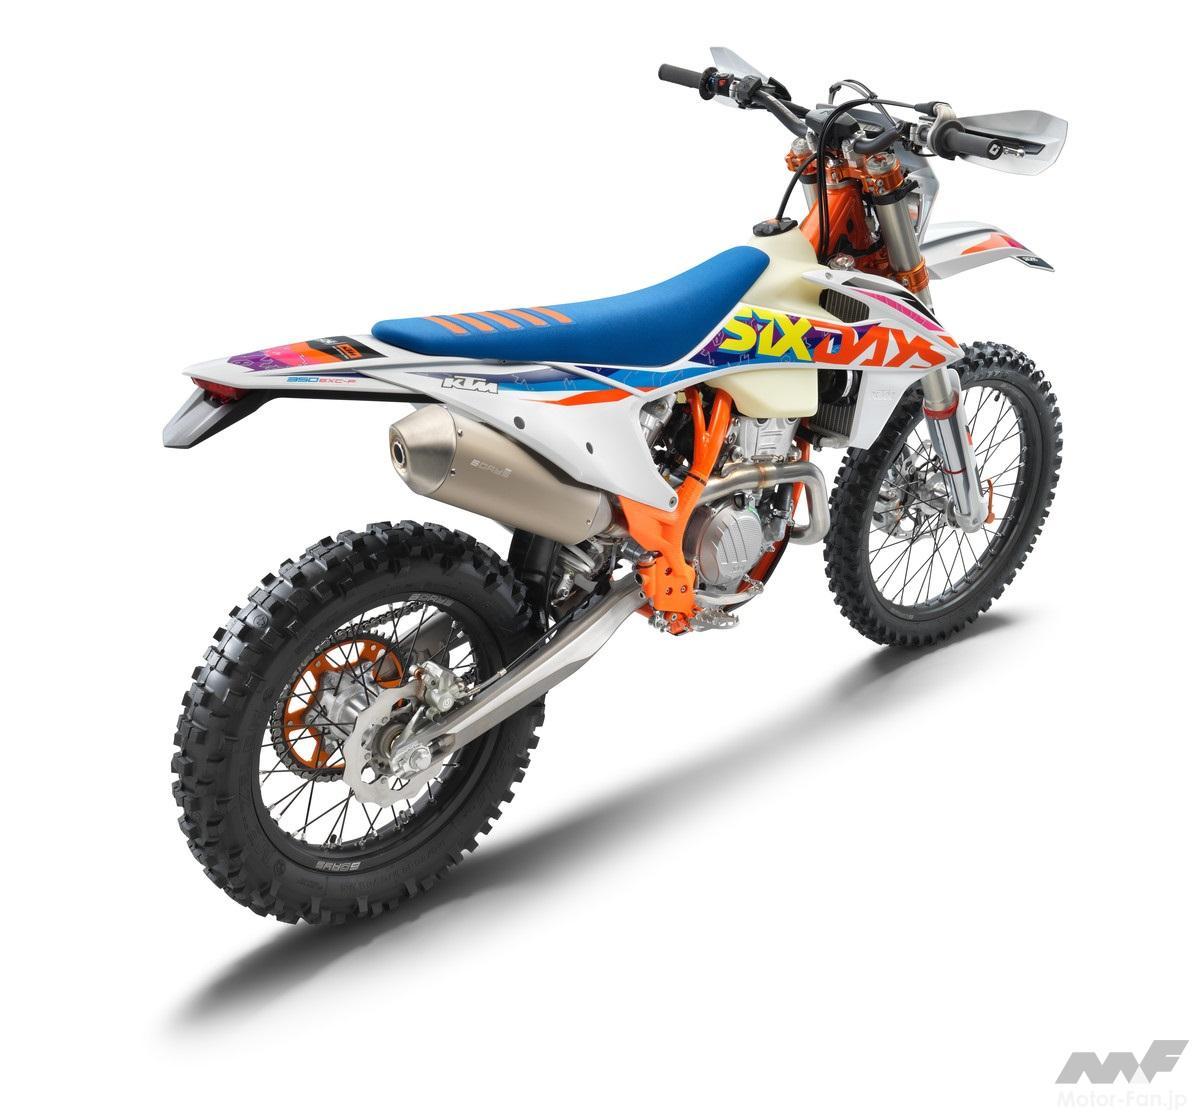 「KTM、MY2022エンデューロモデル12機種を発表」の12枚めの画像